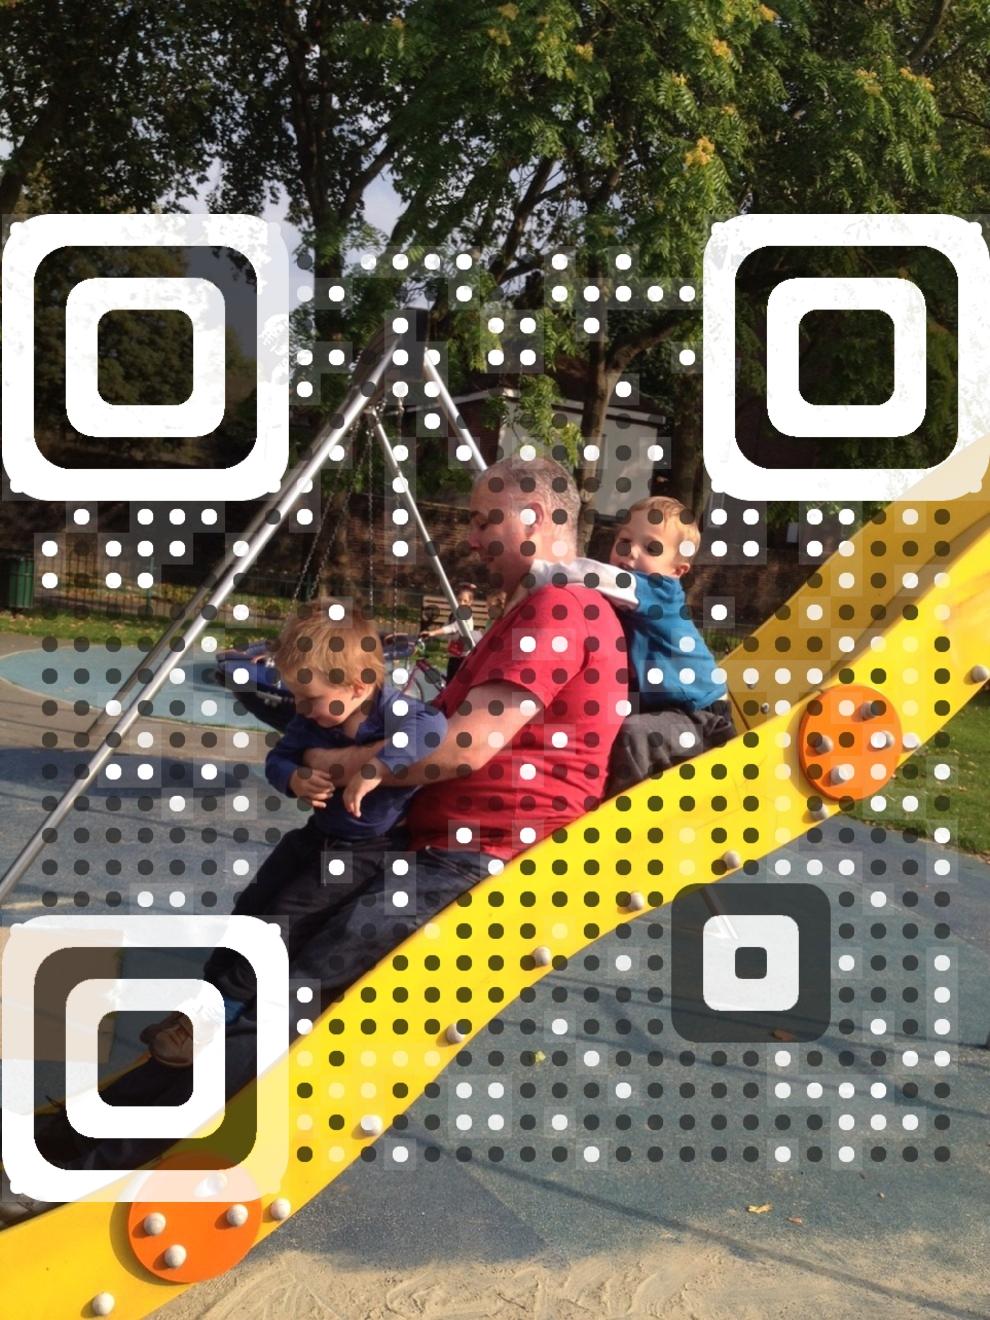 John McIntyre vCard QR Code